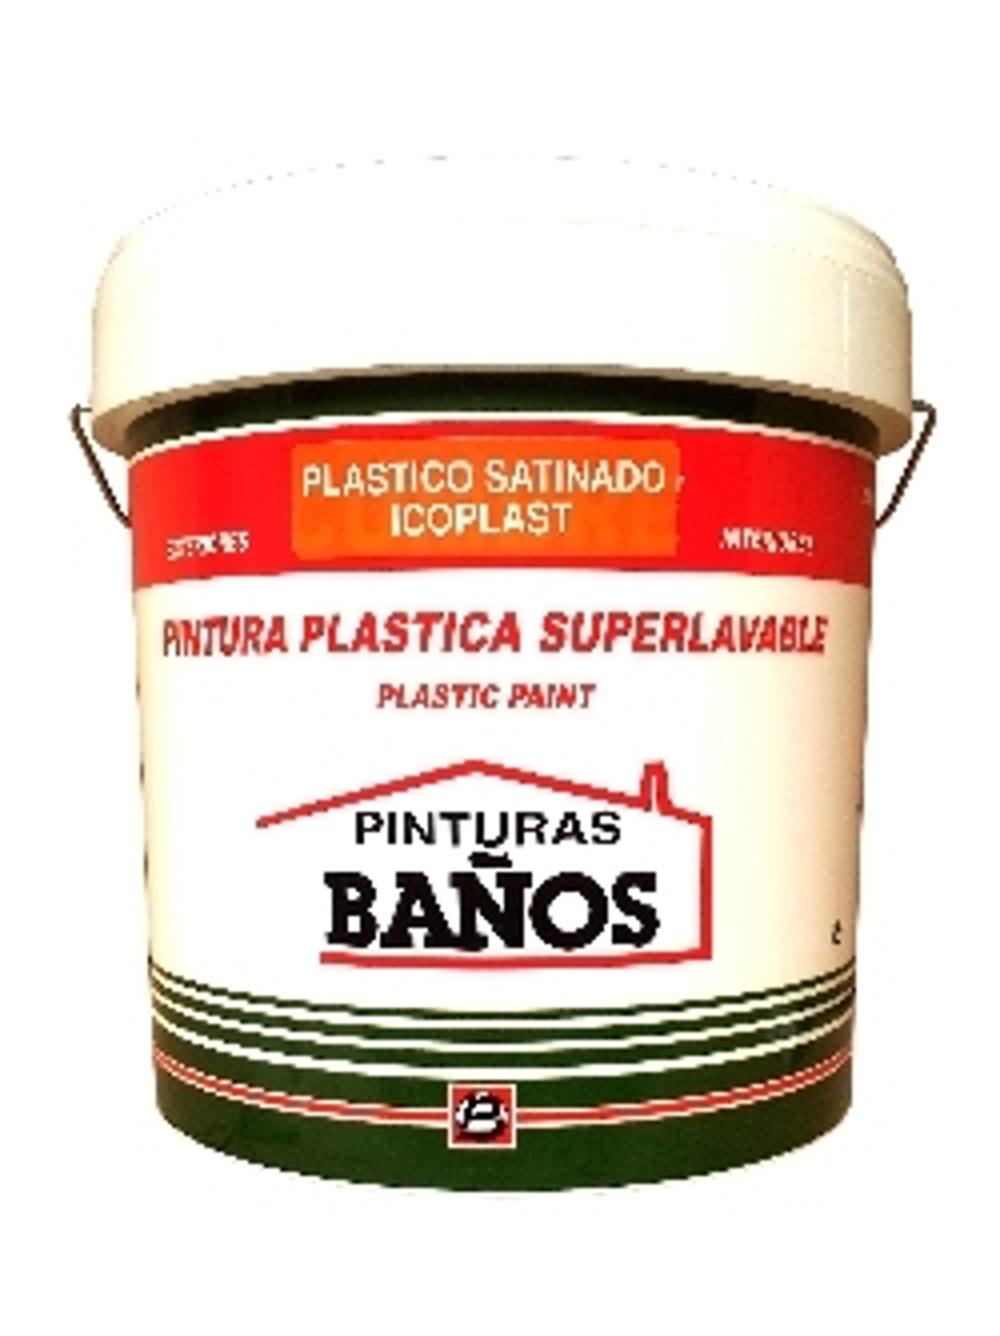 PINTURA PLASTICA SATINADA ICOPLAST COLORES-BERMELLON 4L